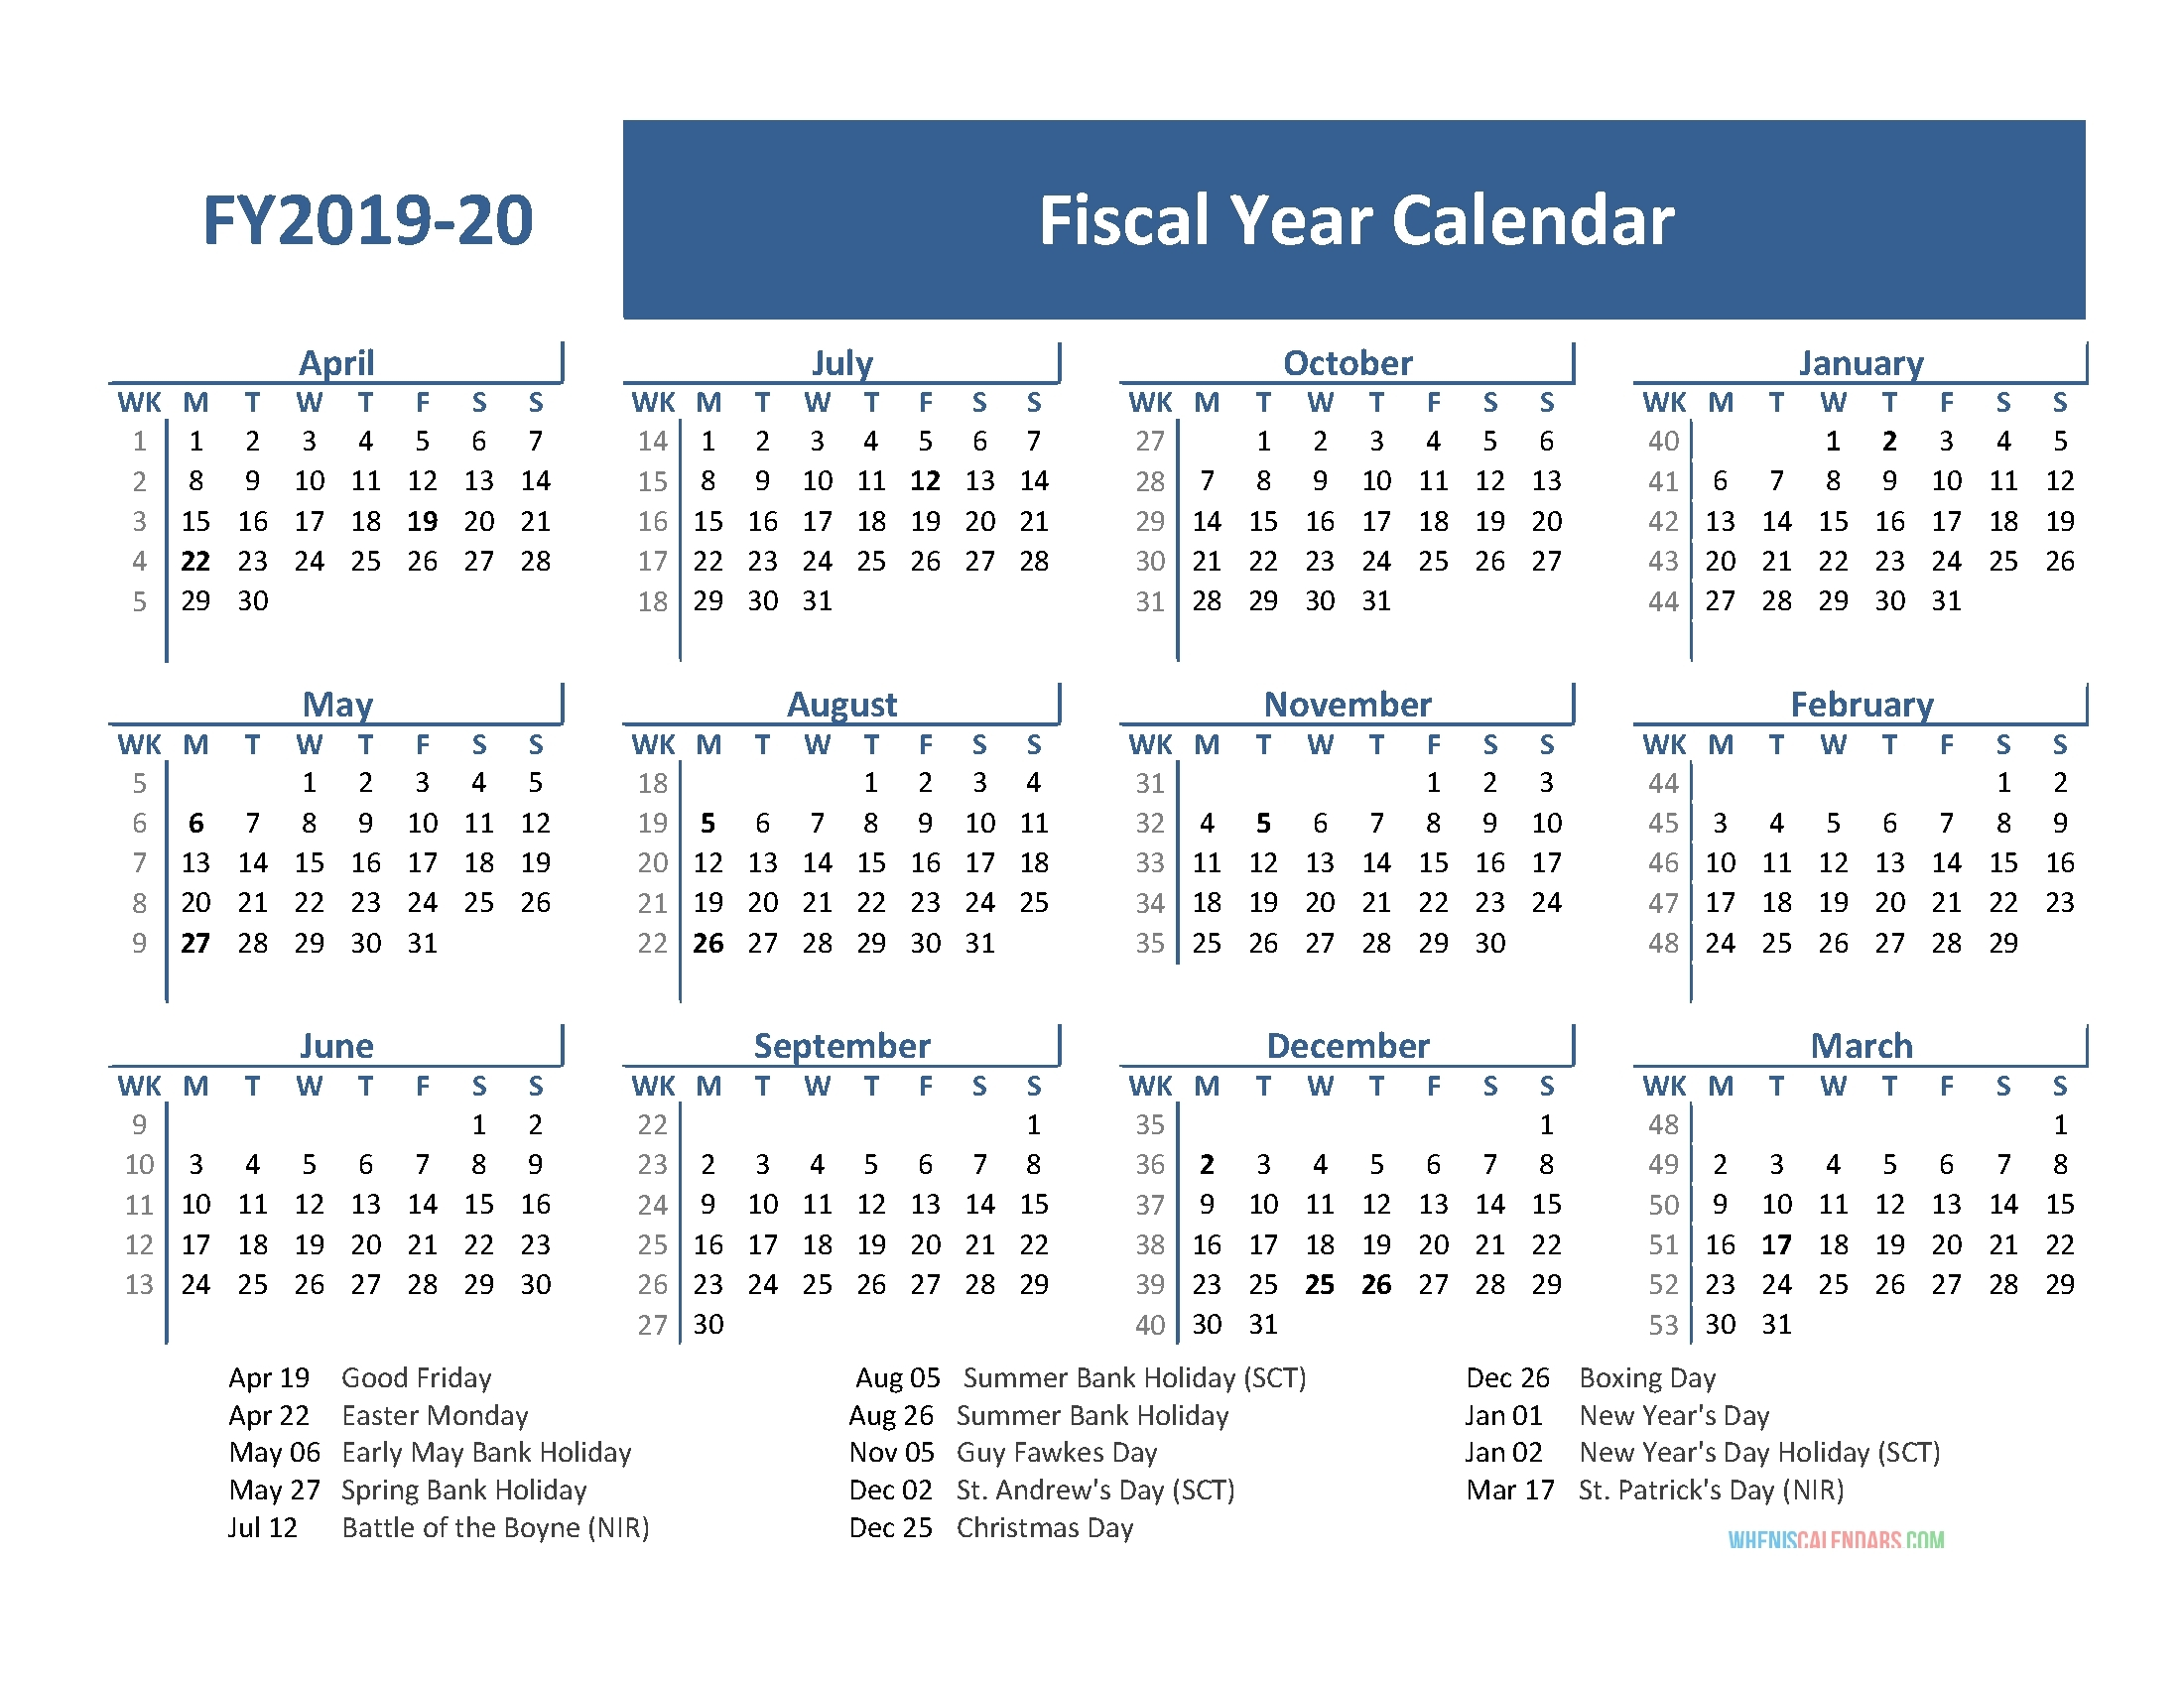 2019-2020 Calendar Financial Week Numbers - Calendar for Financial Calendar 2019/2020 Week Number 25